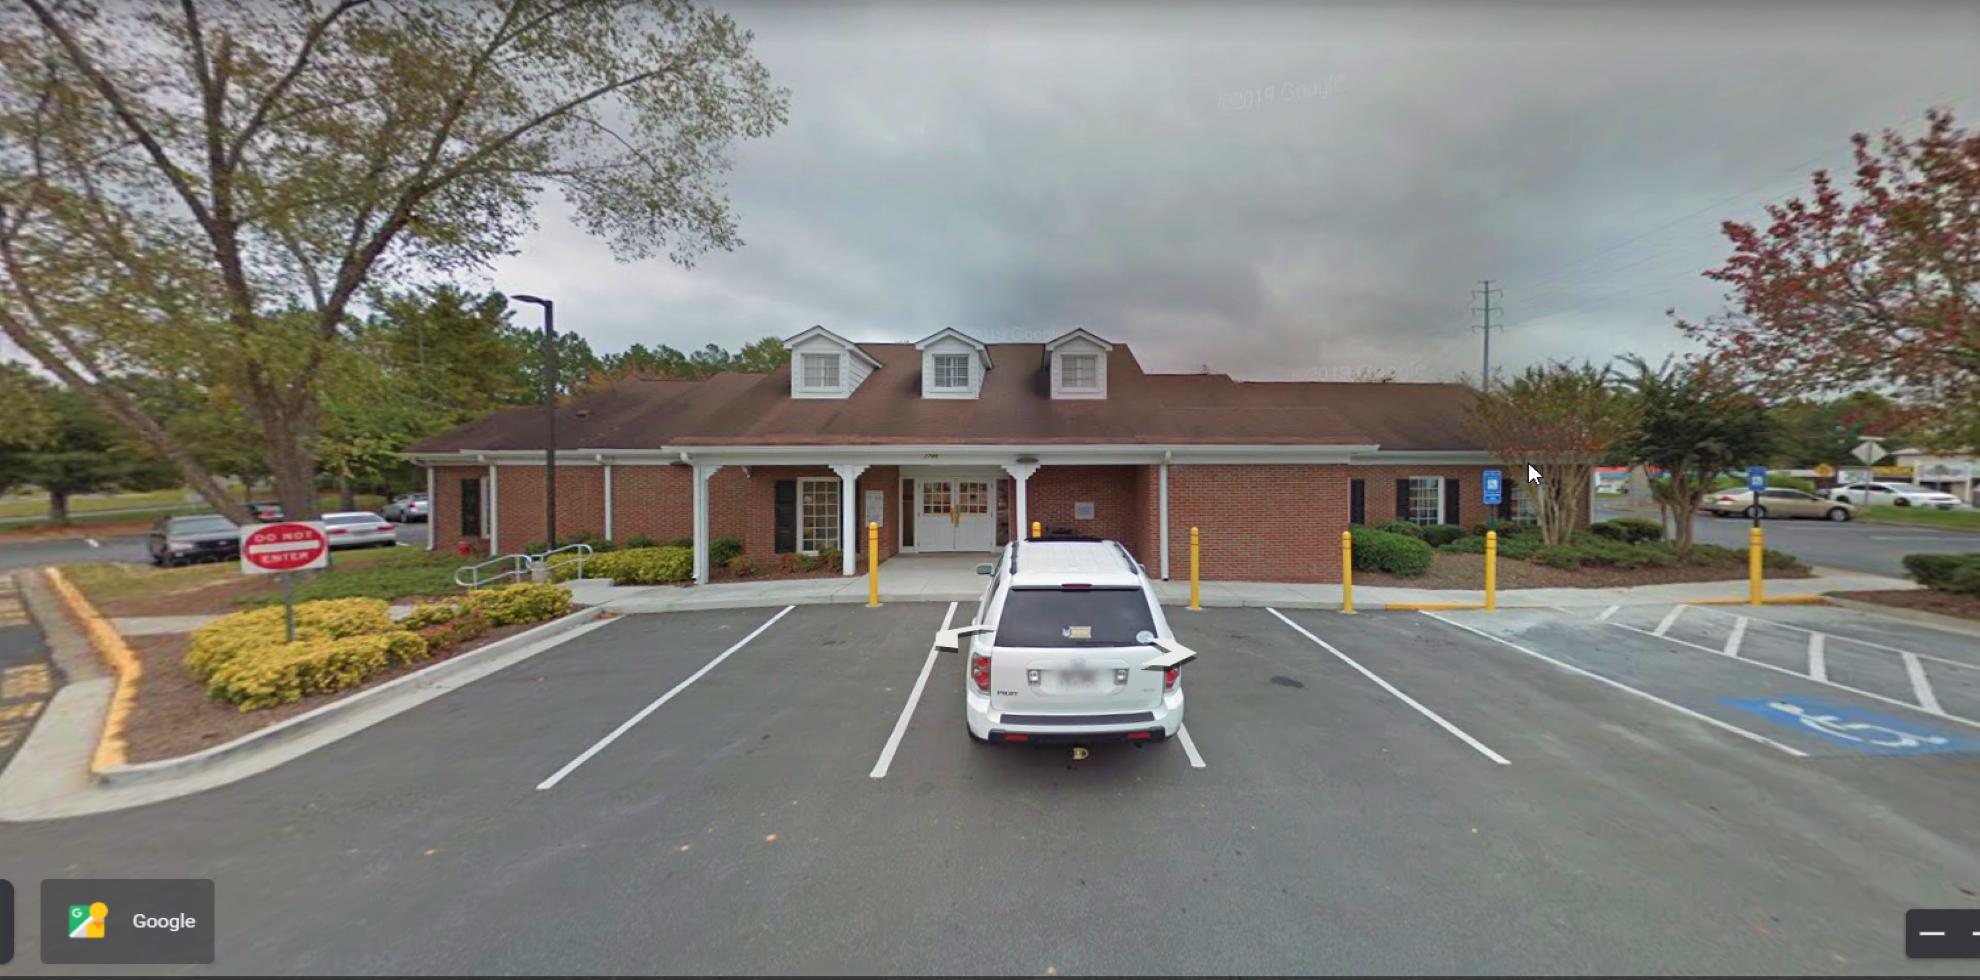 Bank of America financial center with drive-thru ATM and teller   2786 Sandy Plains Rd, Marietta, GA 30066